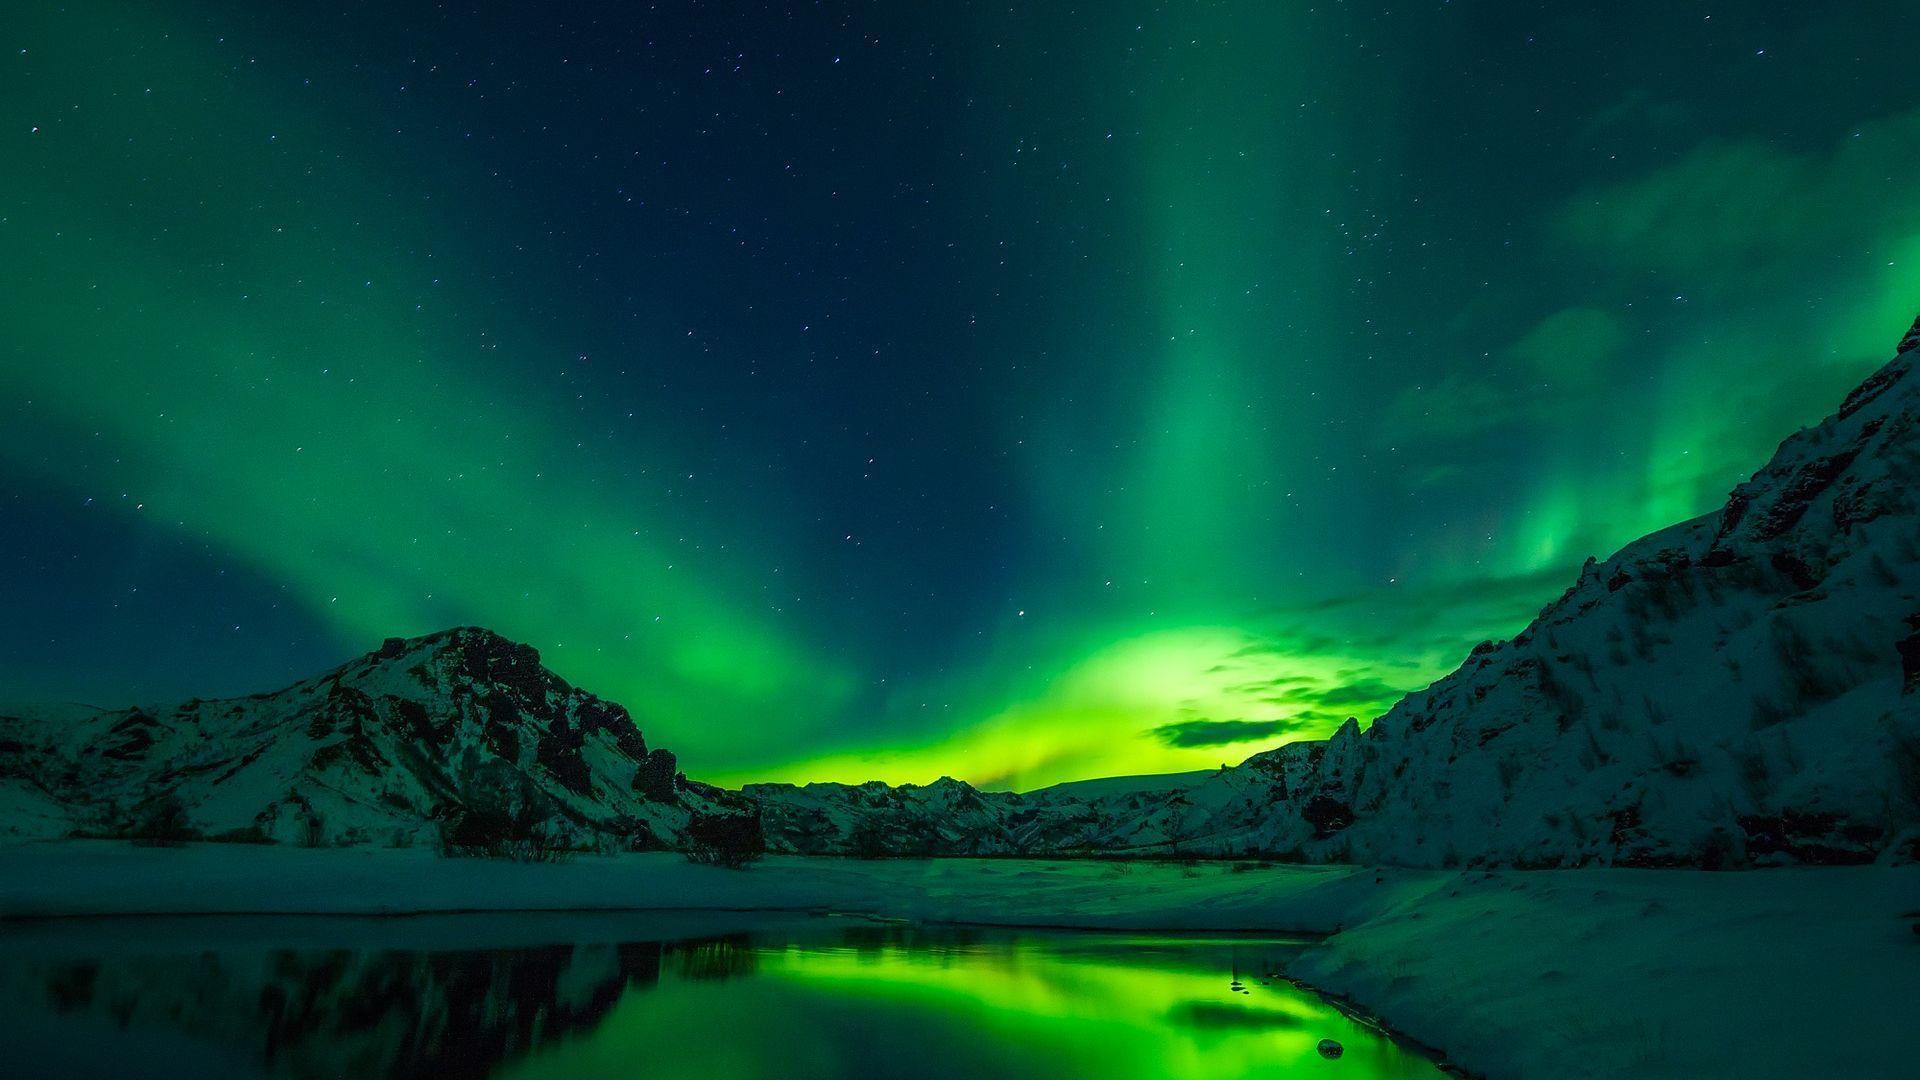 Aurora Night Sky Wallpapers Top Free Aurora Night Sky Backgrounds Wallpaperaccess